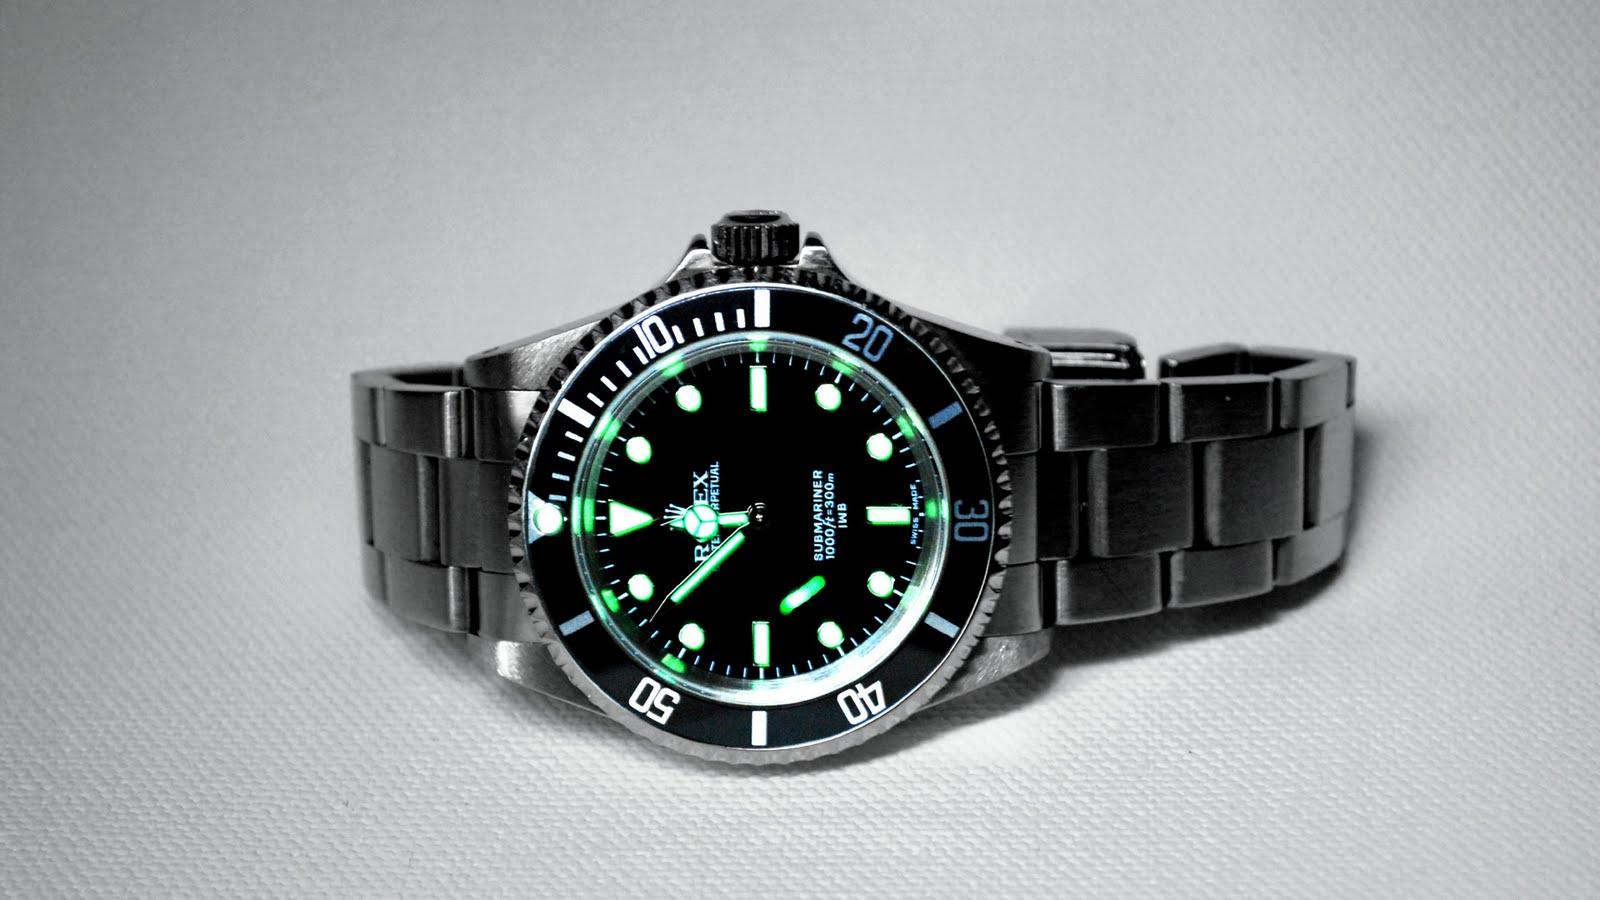 Good Rolex Wallpaper - RolexHd1 You Should Have_543225.jpg